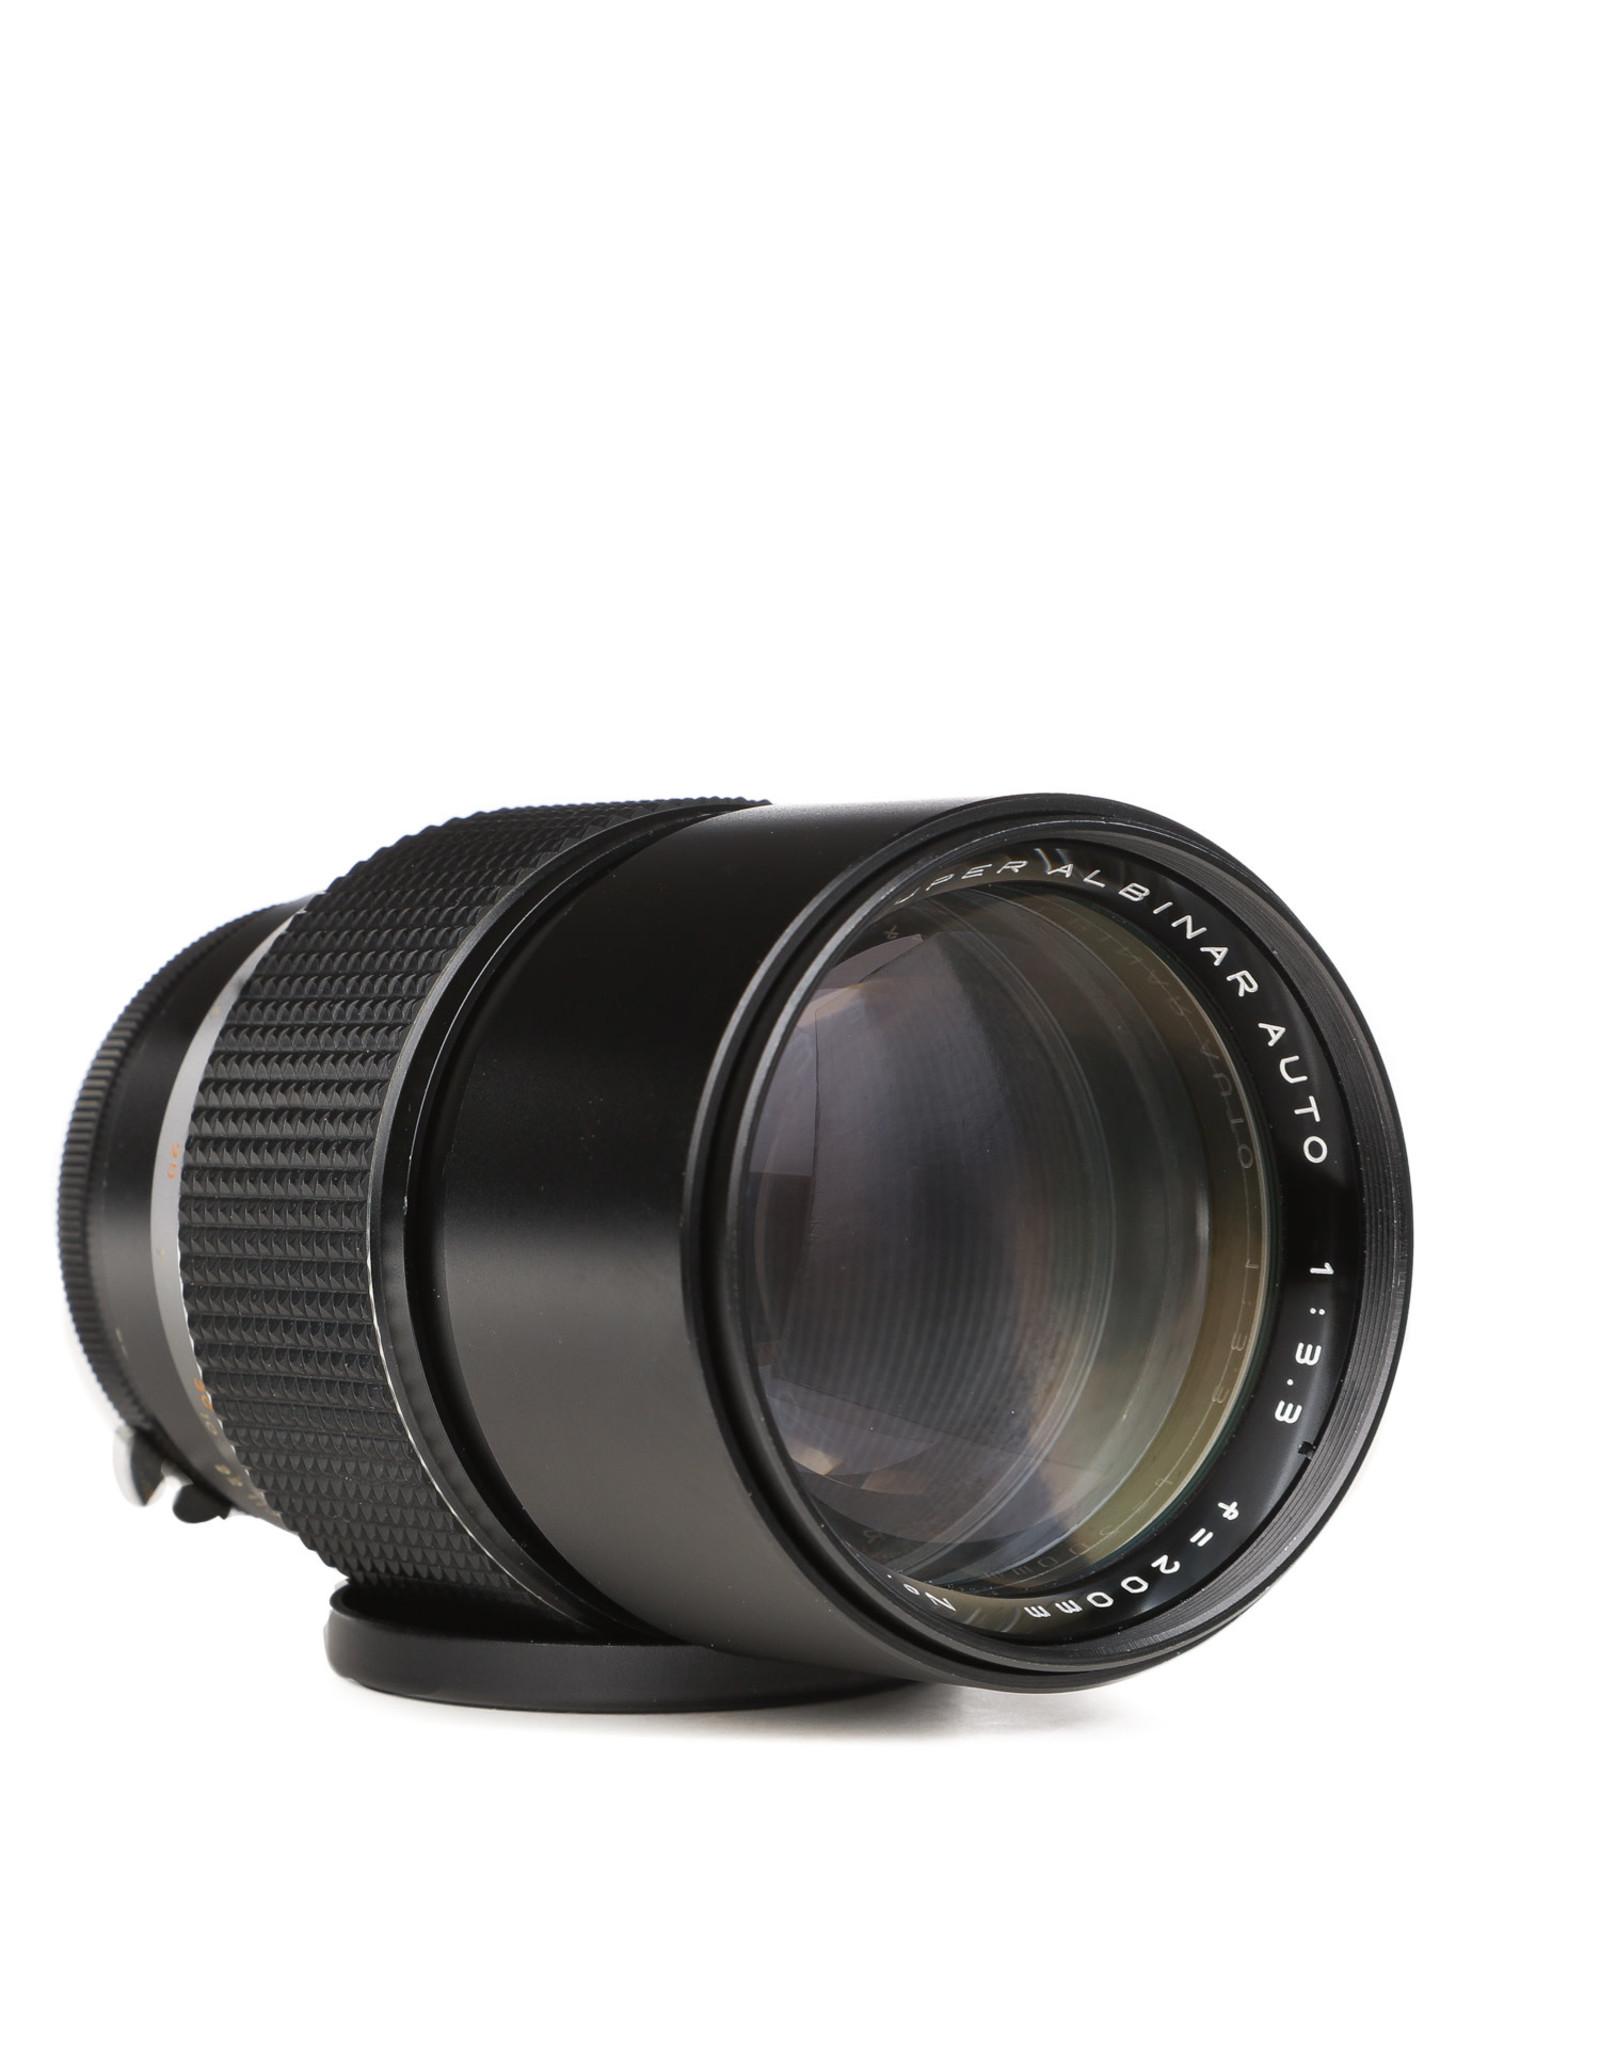 Albinar Super  Albinar 200mm f/3.3 Lens for Nikon F